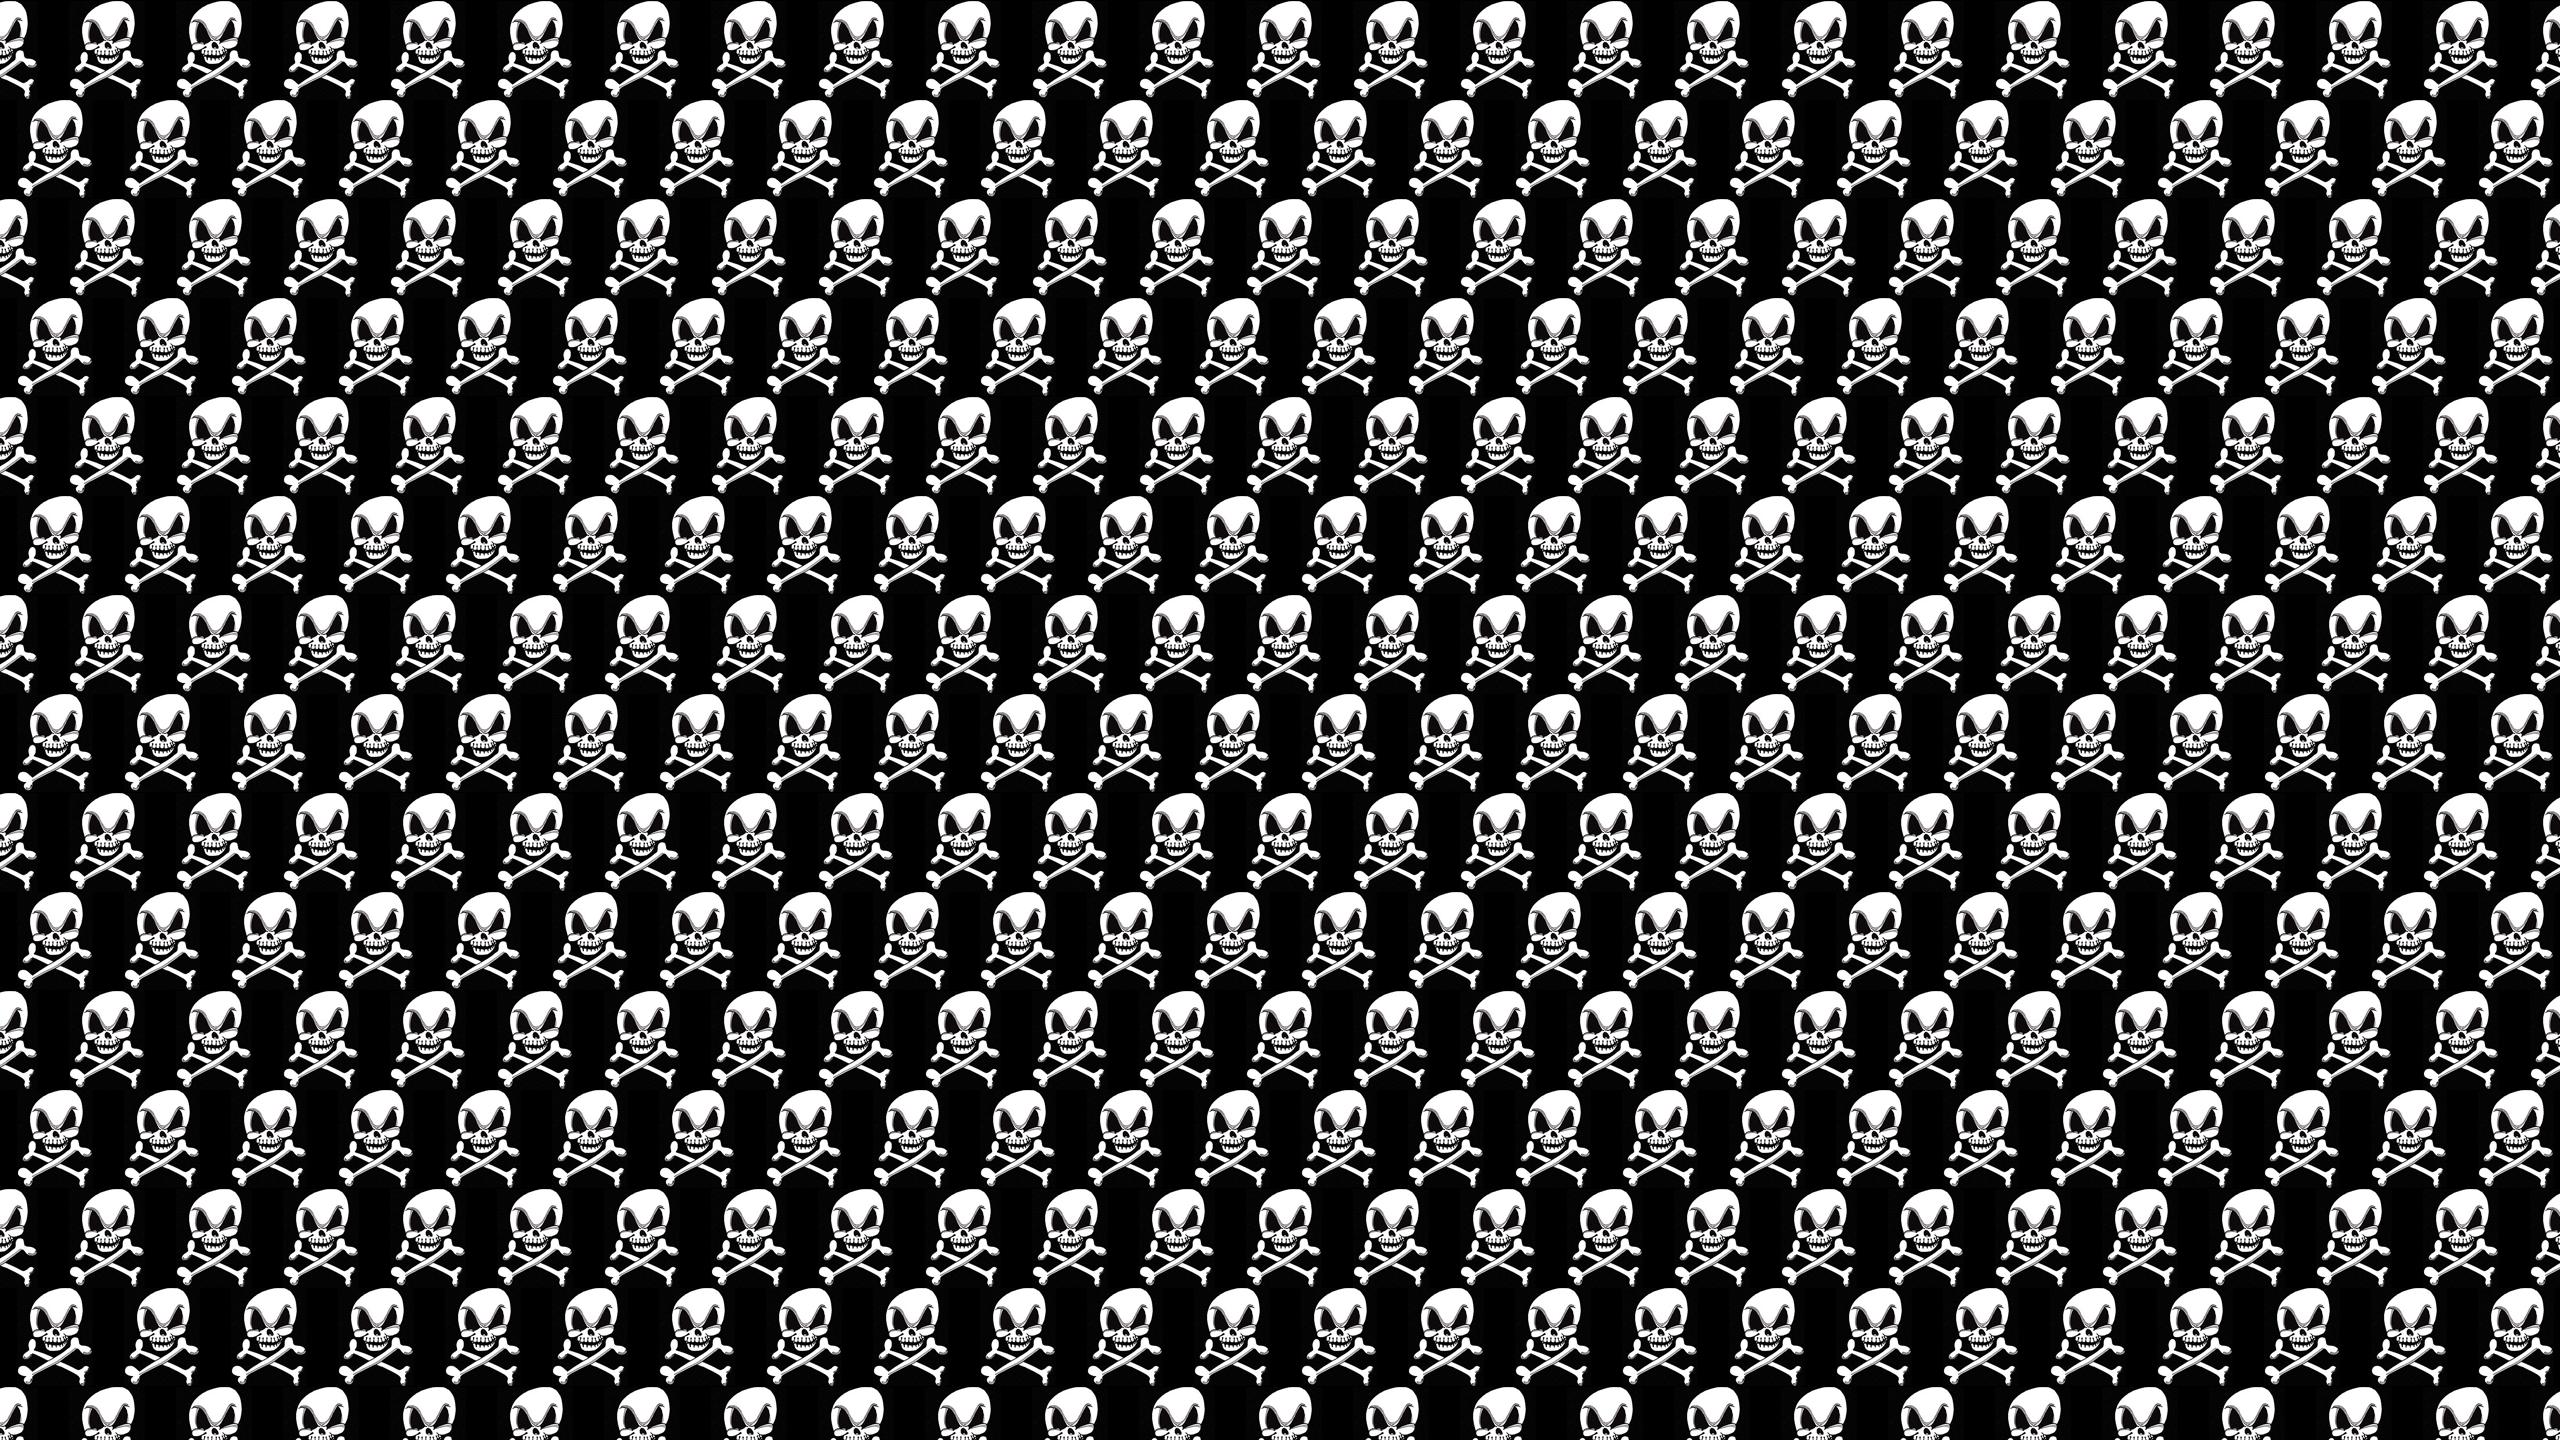 Skull Backgrounds - Wallpaper Cave